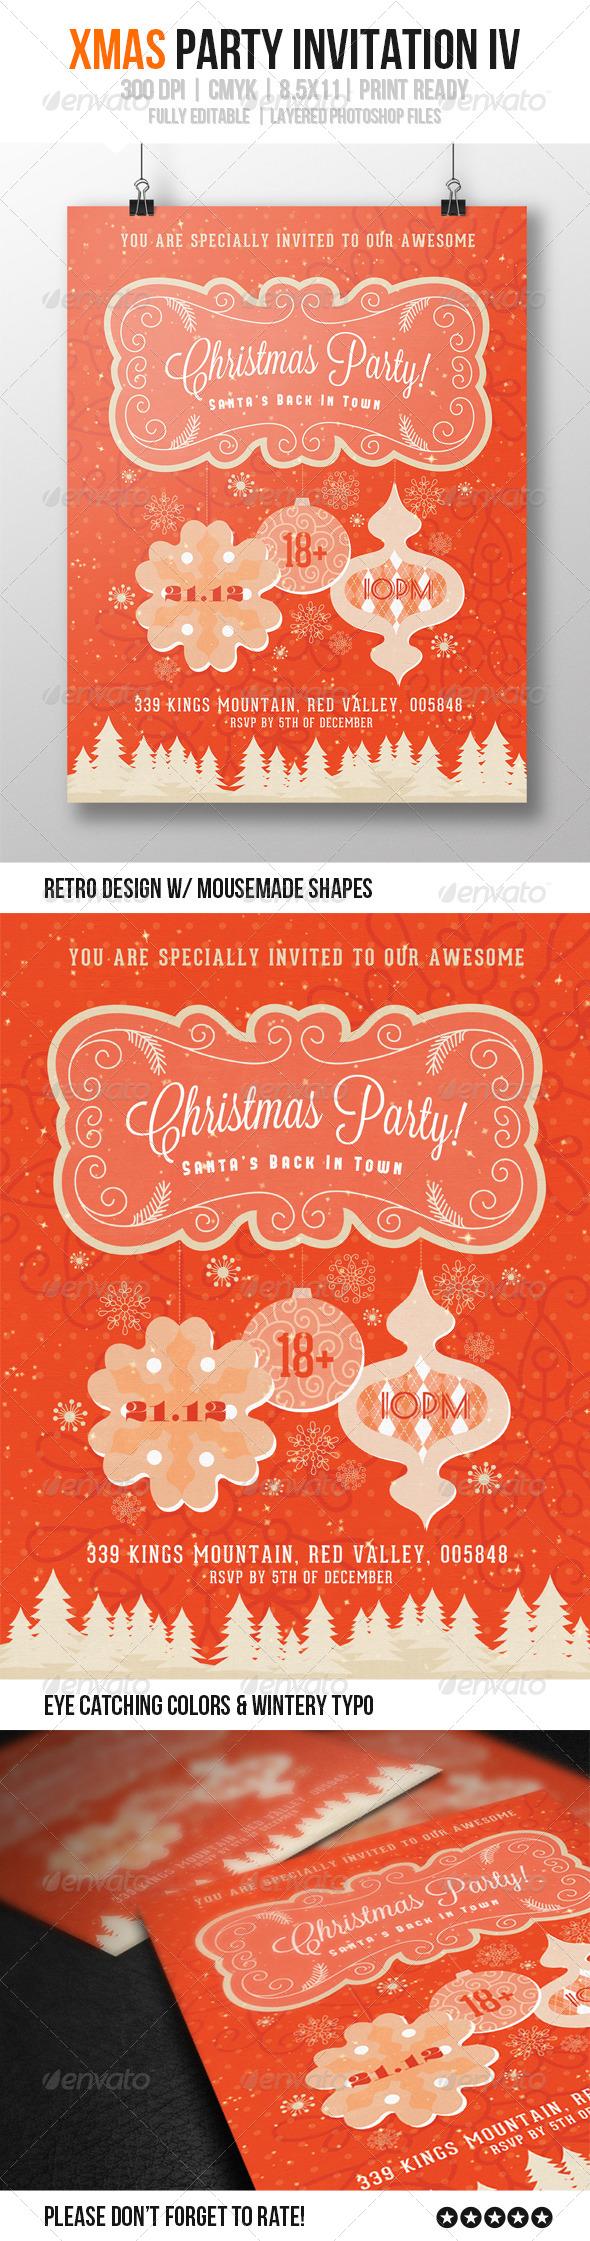 GraphicRiver xMas Party Invitation IV 6281334